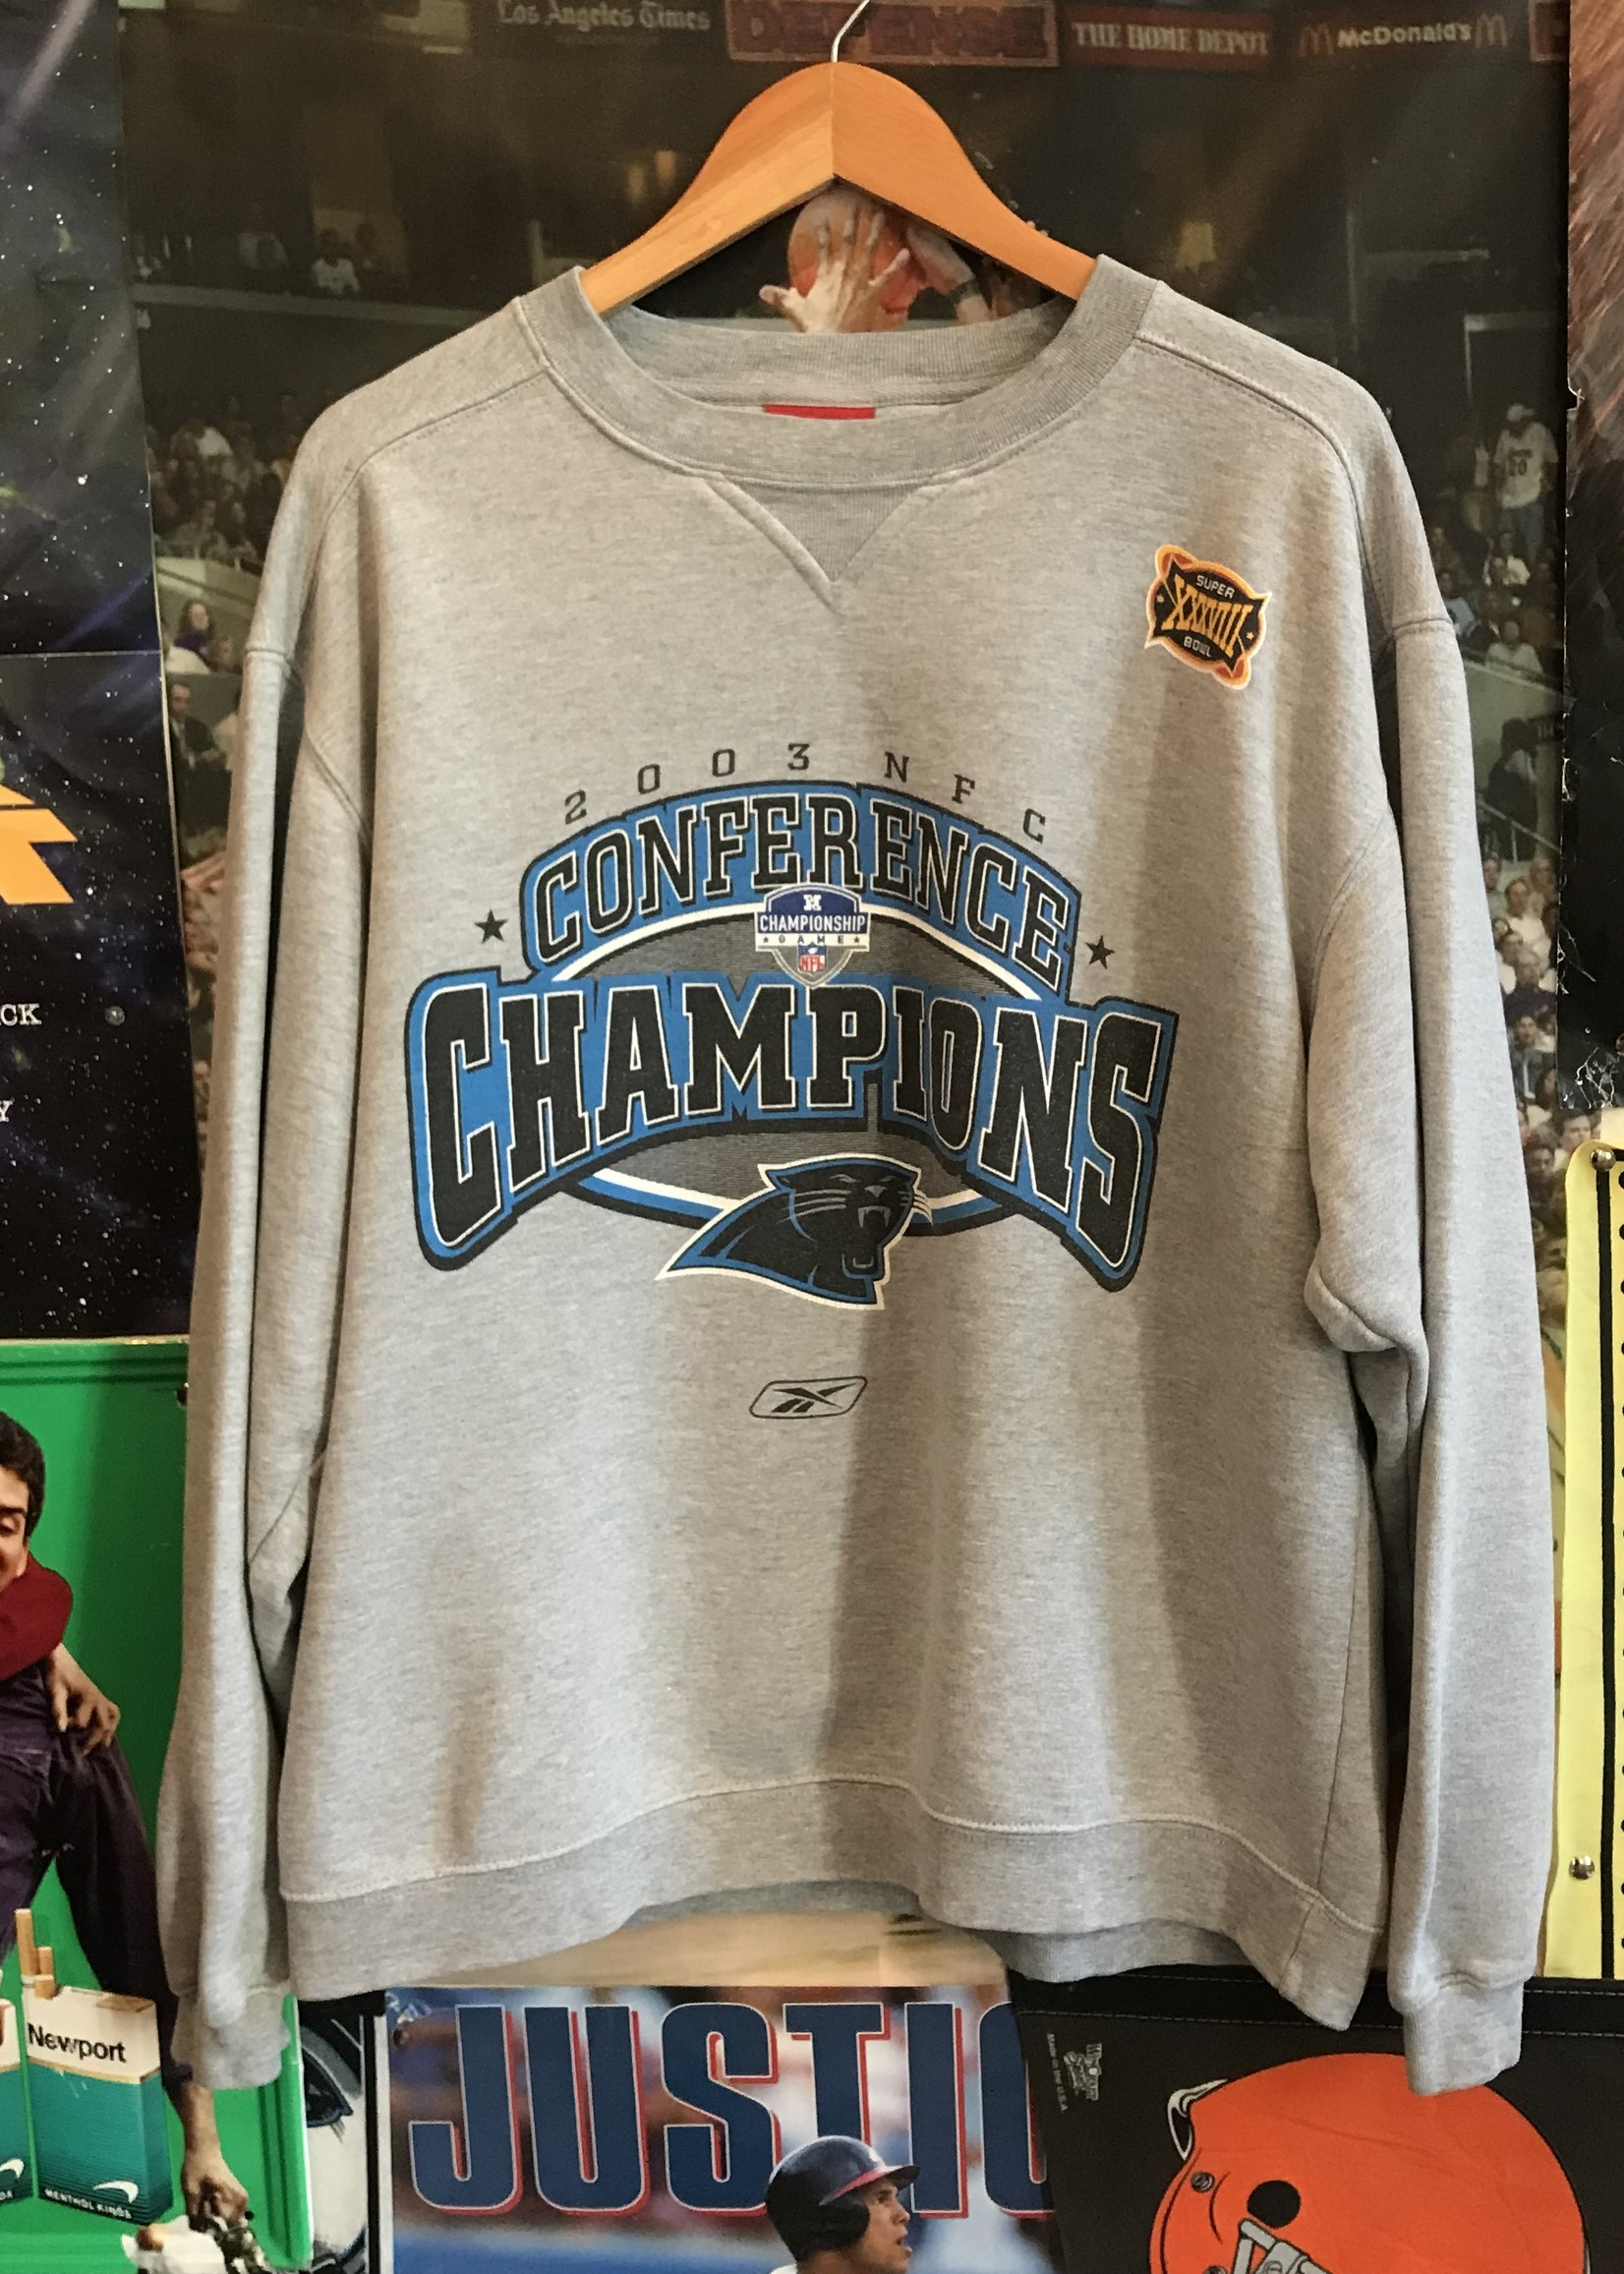 44712003 panthers nfc champs crewneck gray sz M